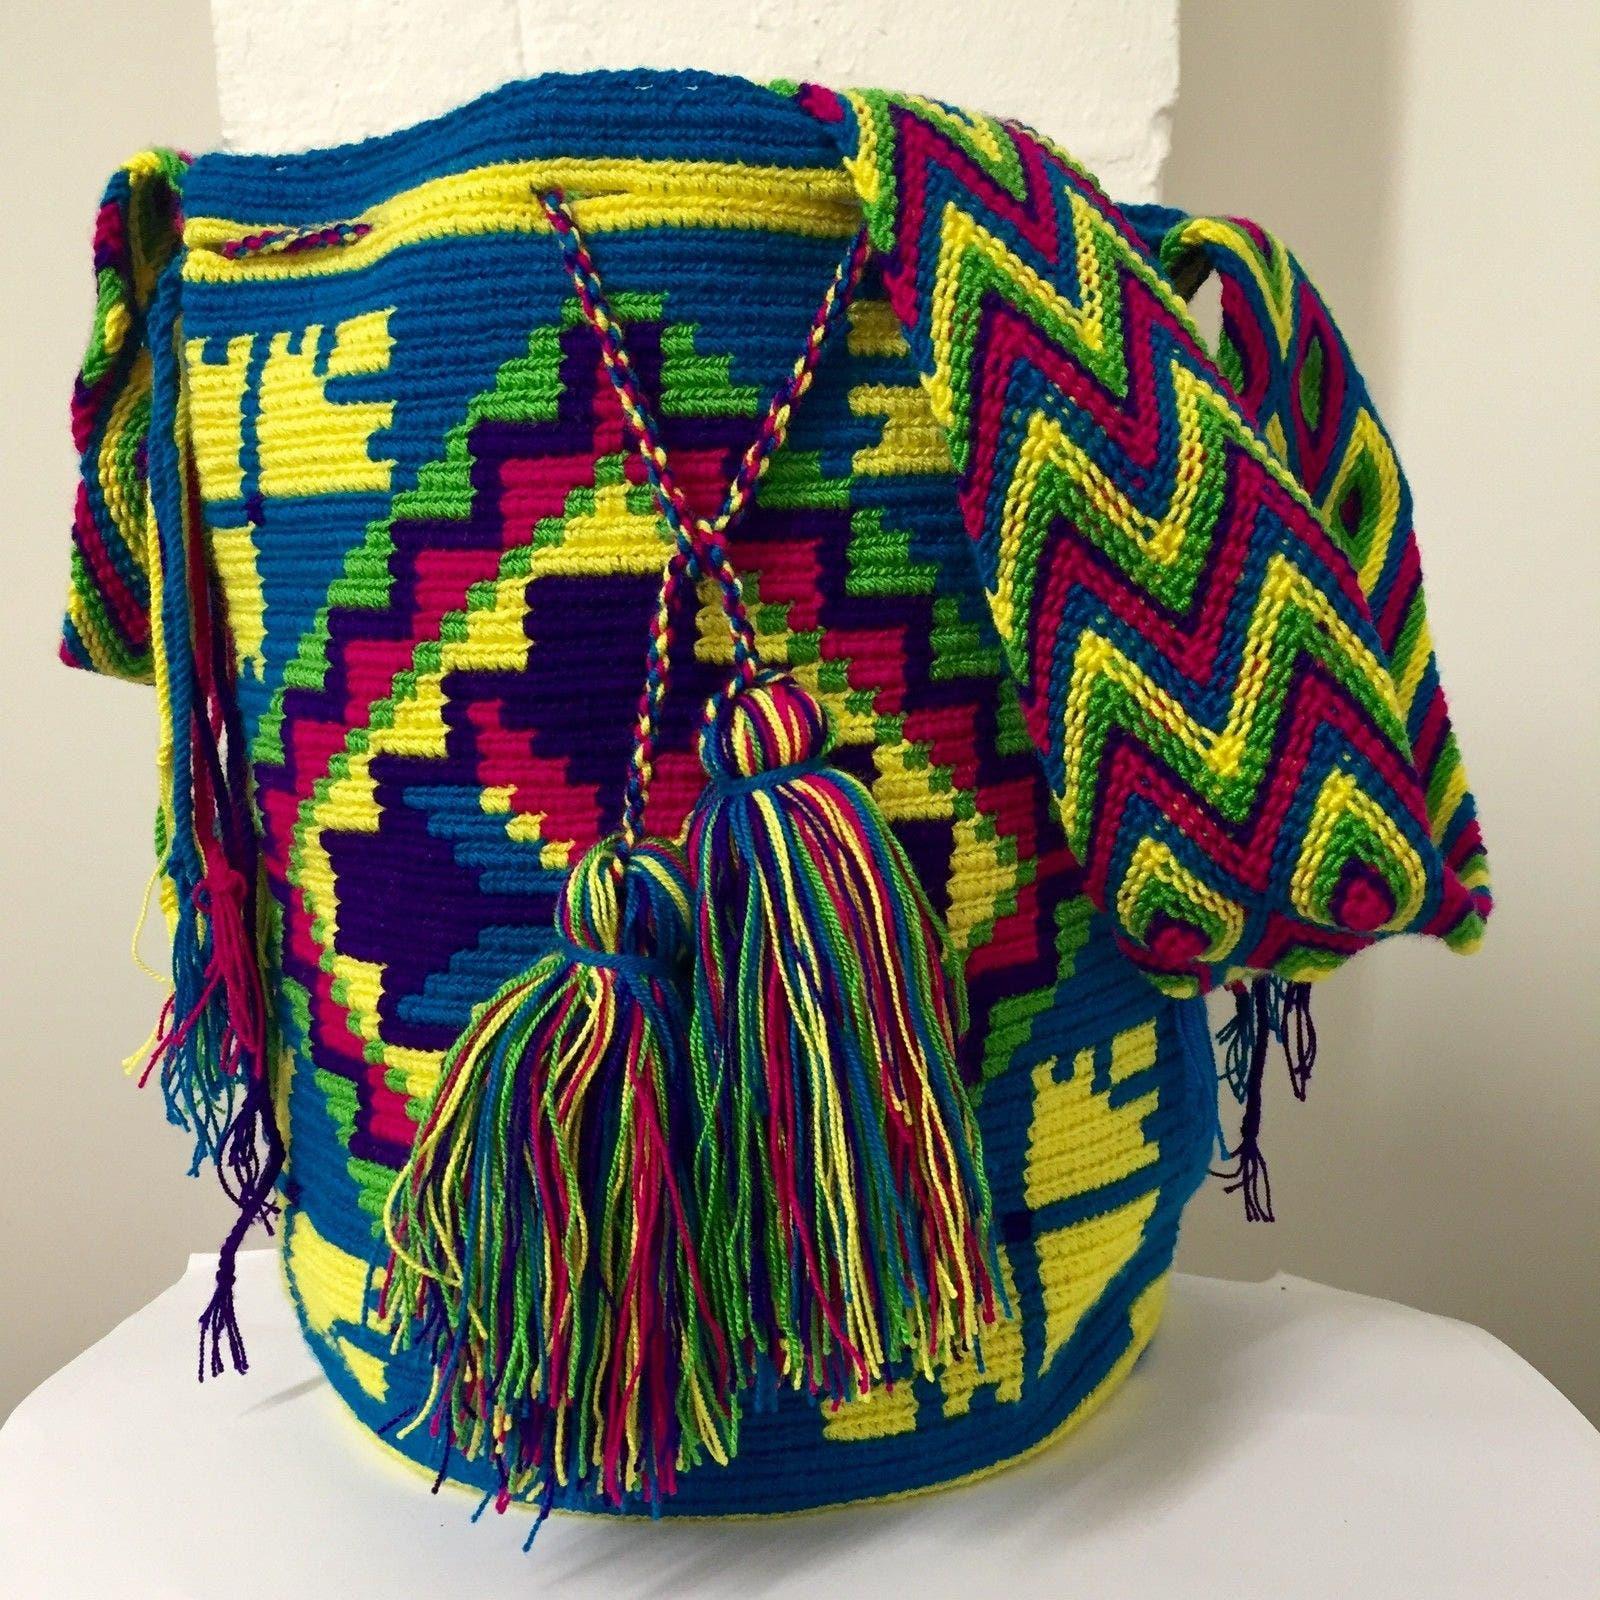 Akarachi Hand Made Wayuu Bag -  Wayuu Tribe Project